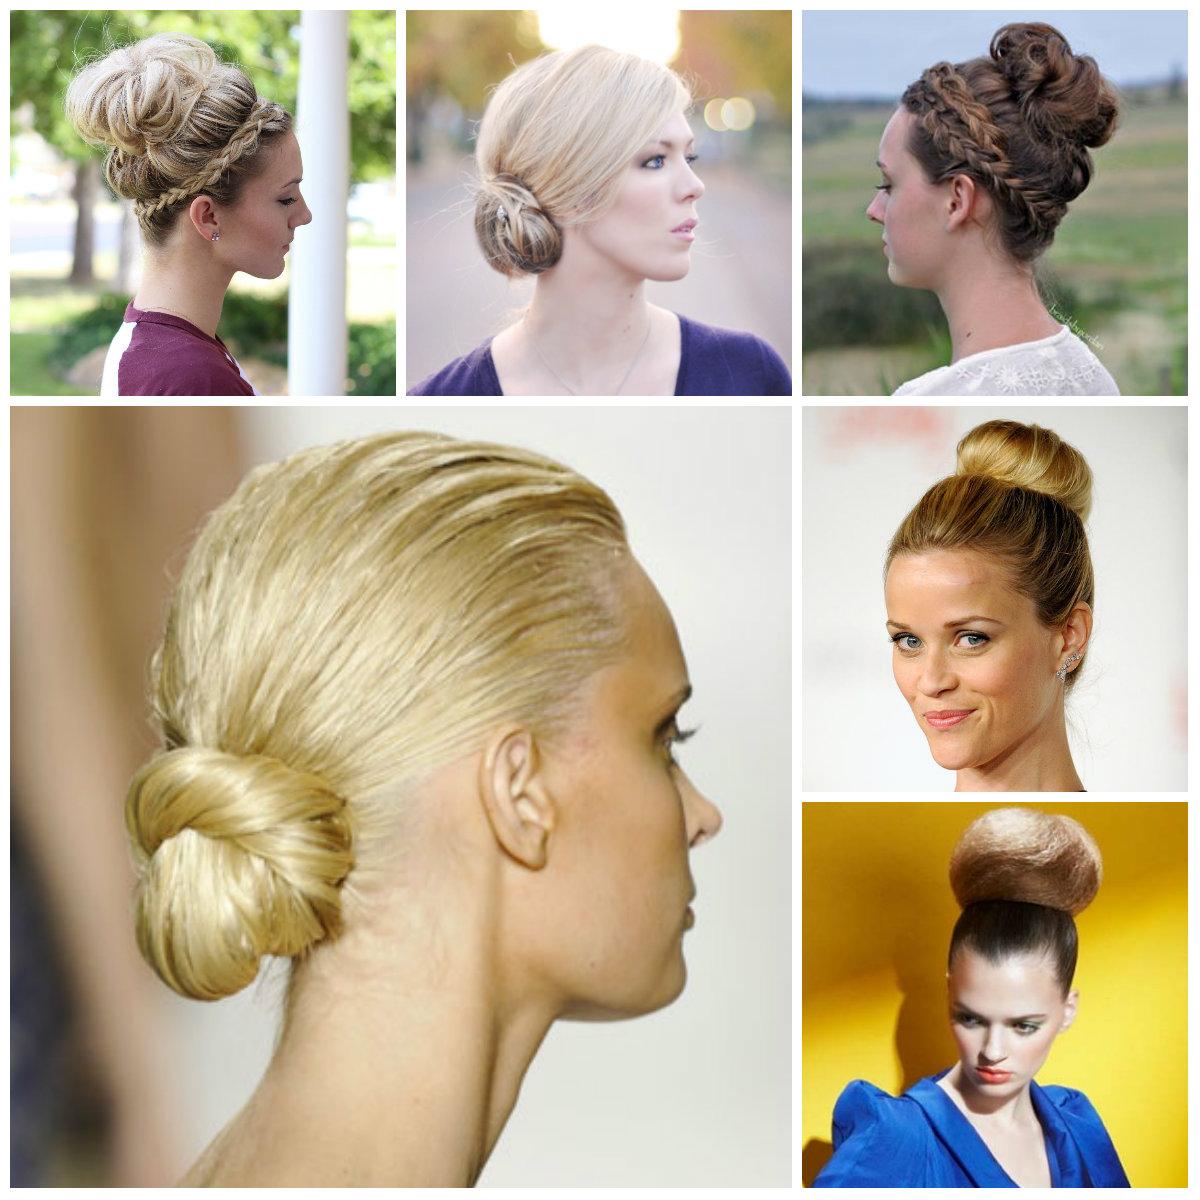 classy bun hairstyles 2022